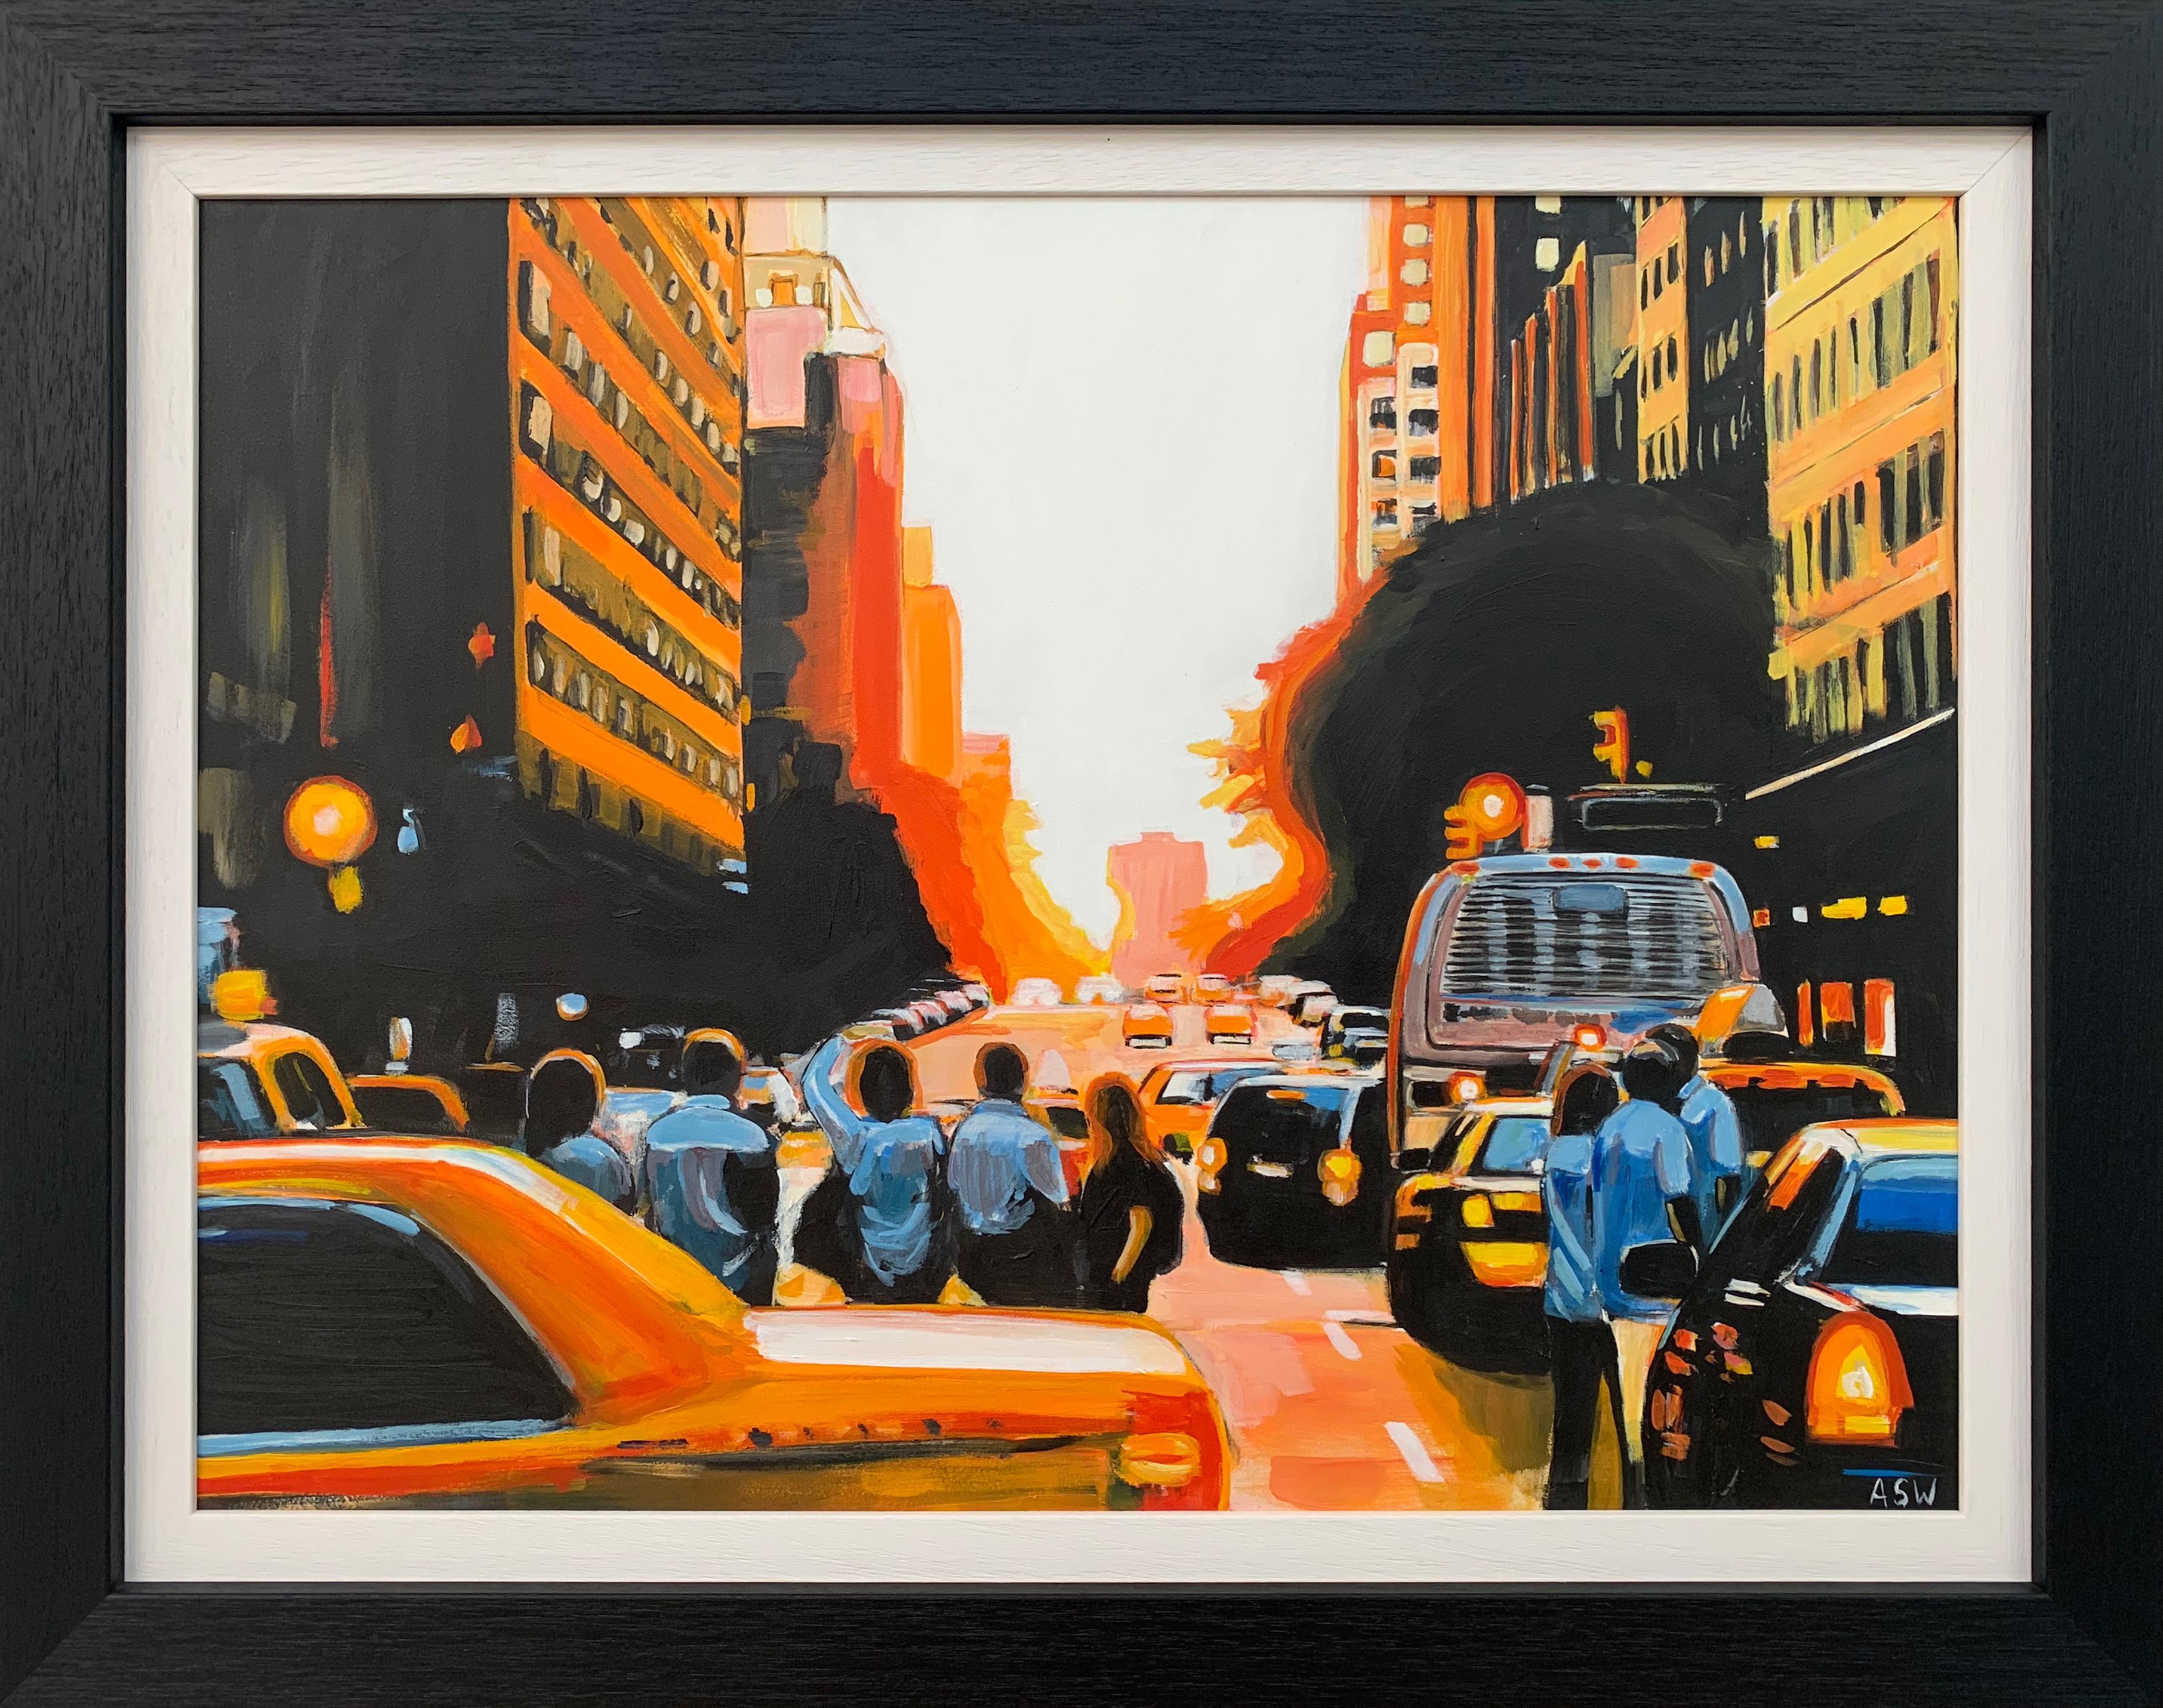 Figures at Manhattan Henge Sunset New York City by Leading British Urban Artist